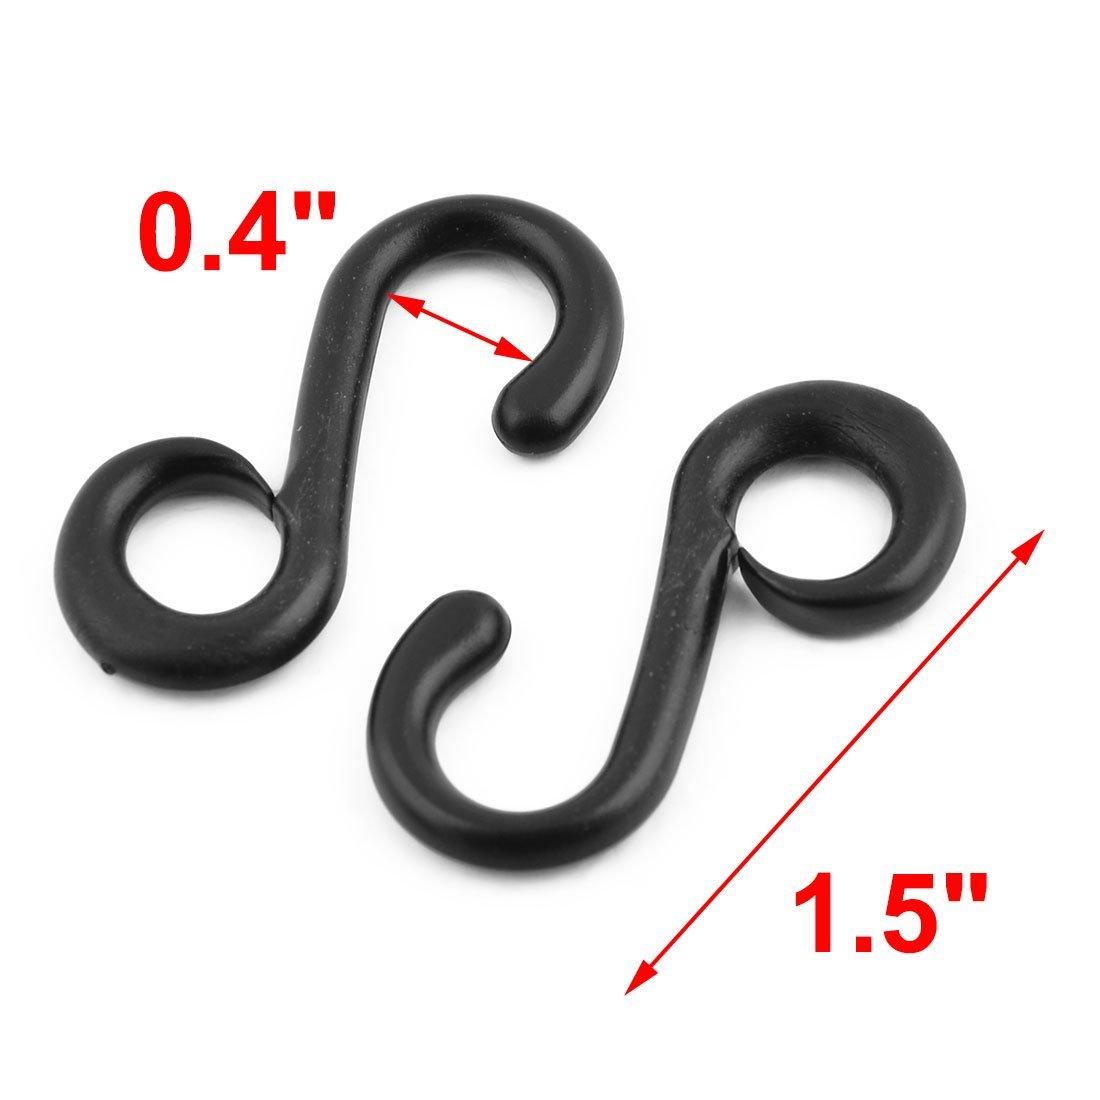 Amazon.com: eDealMax Plástico Forma Bolsa S Correa conectivo de resorte giratorio Anillo ganchos de la Hebilla 12pcs Negro: Home & Kitchen